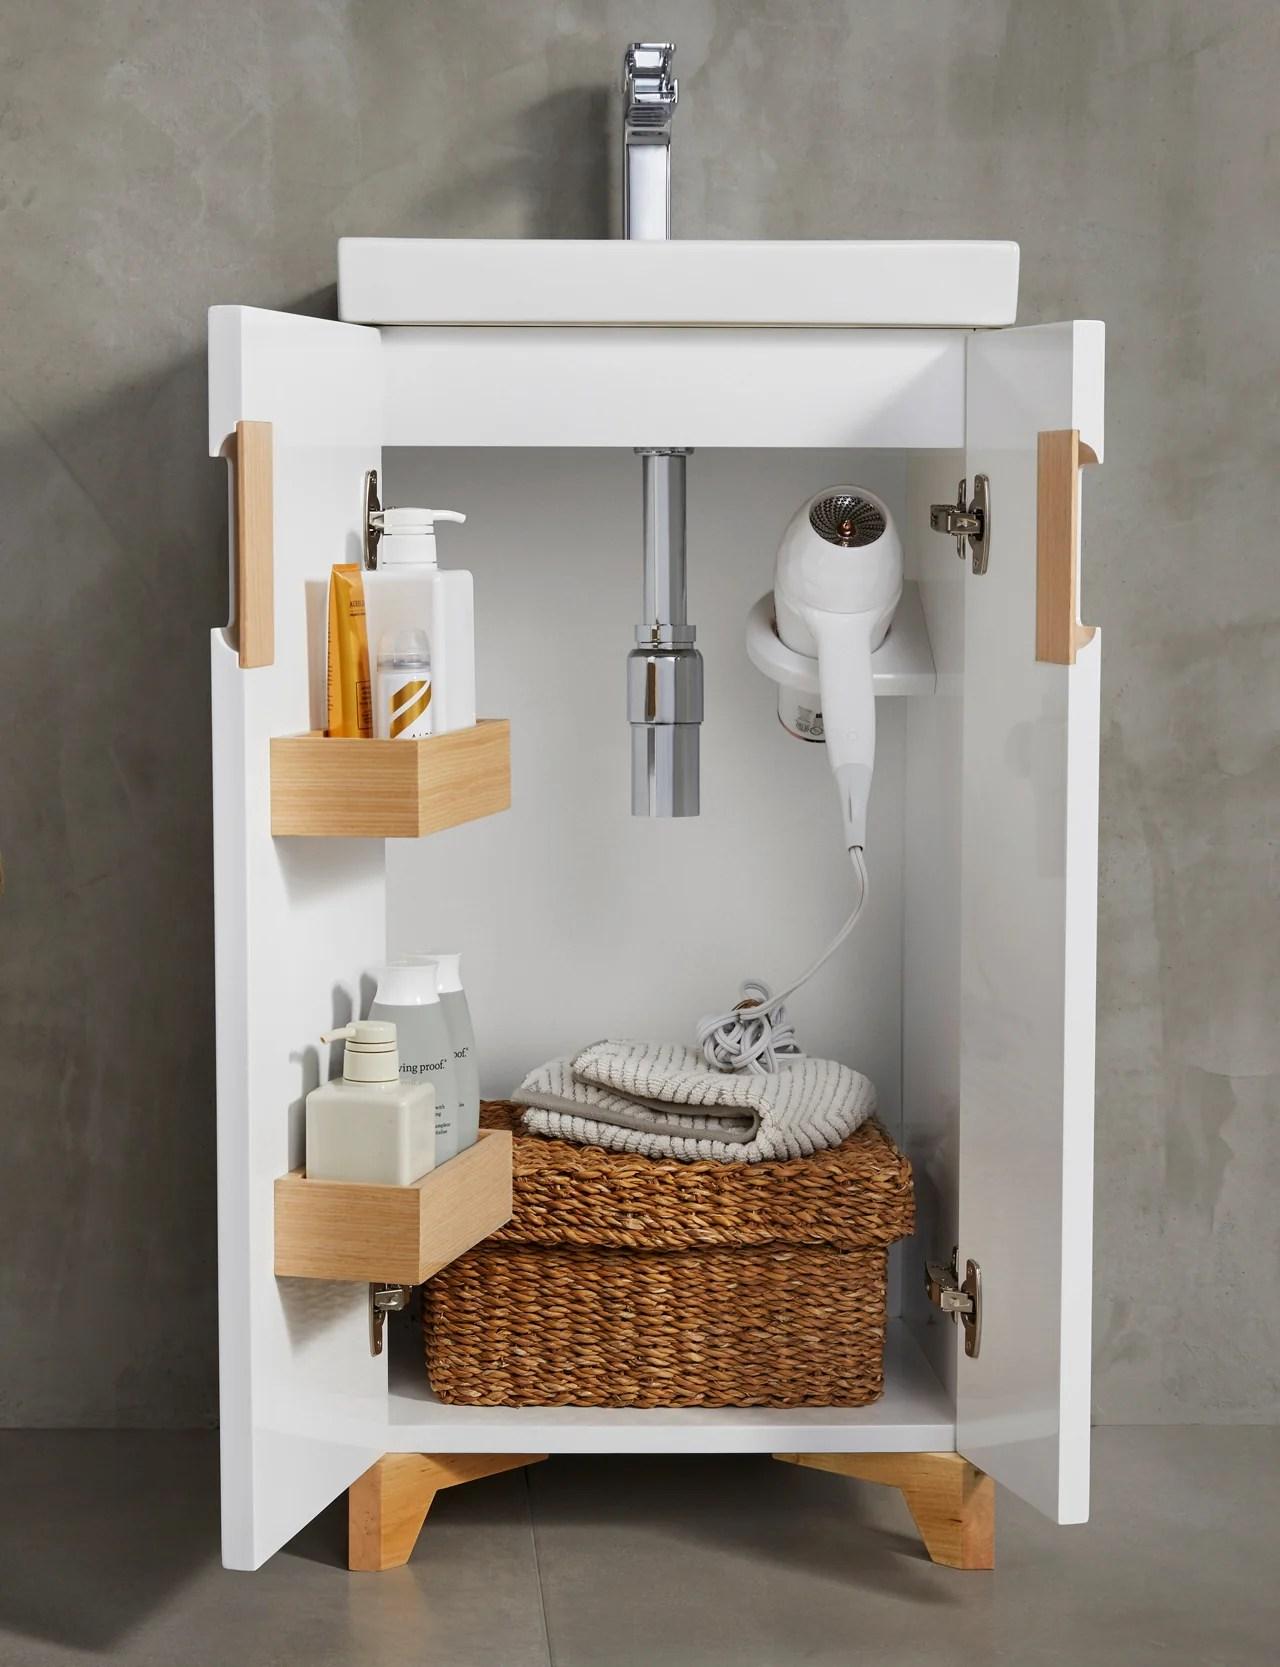 Tiny Triumph 30 Of The Best Small Bathroom Design Ideas